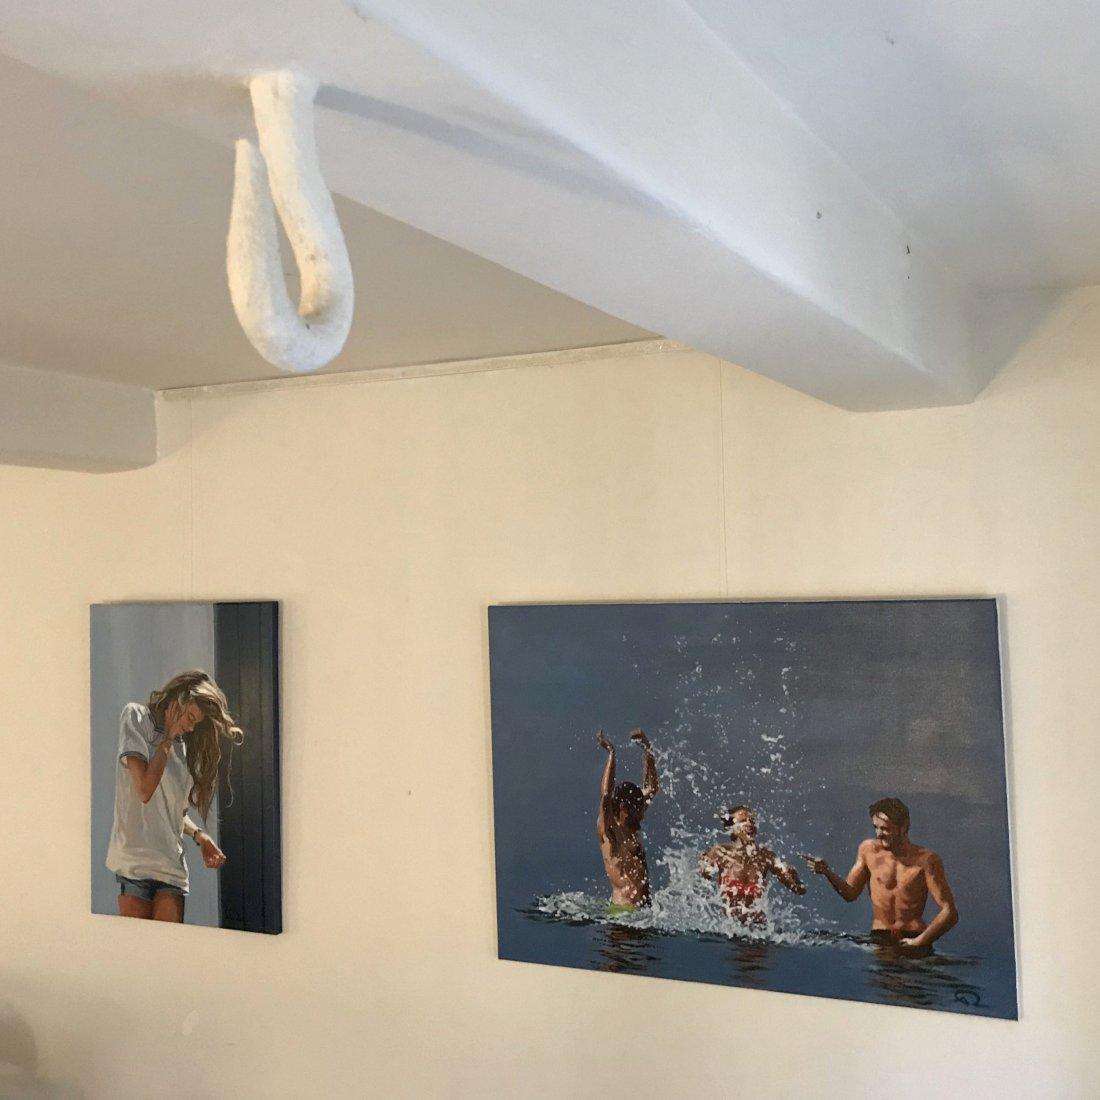 antoinerenault-amsterdam-exhibition-art-thethinkinghut-8